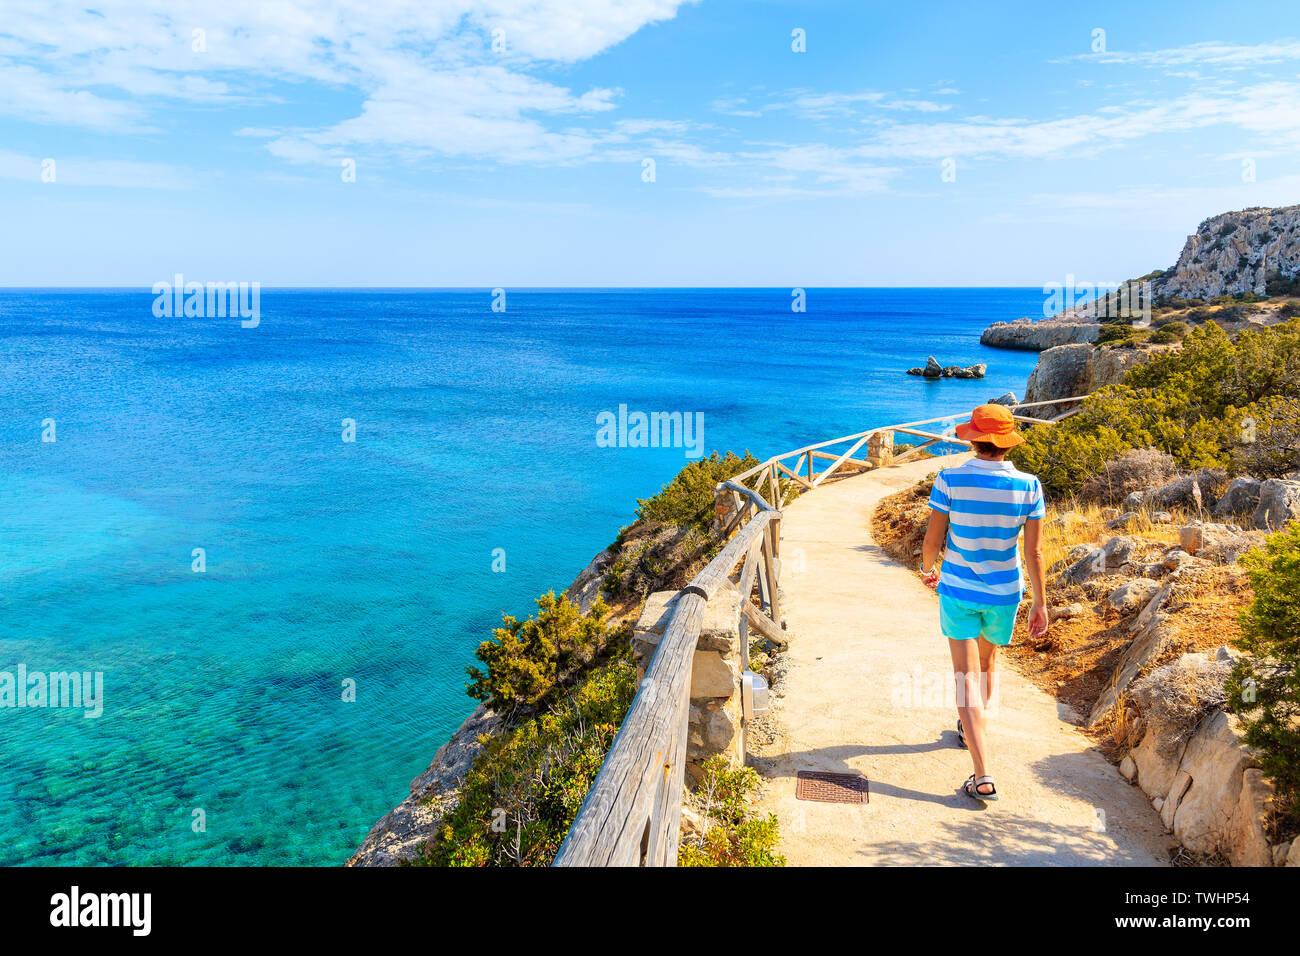 Young woman walking on coastal path along sea near Ammopi village, Karpathos island, Greece Stock Photo